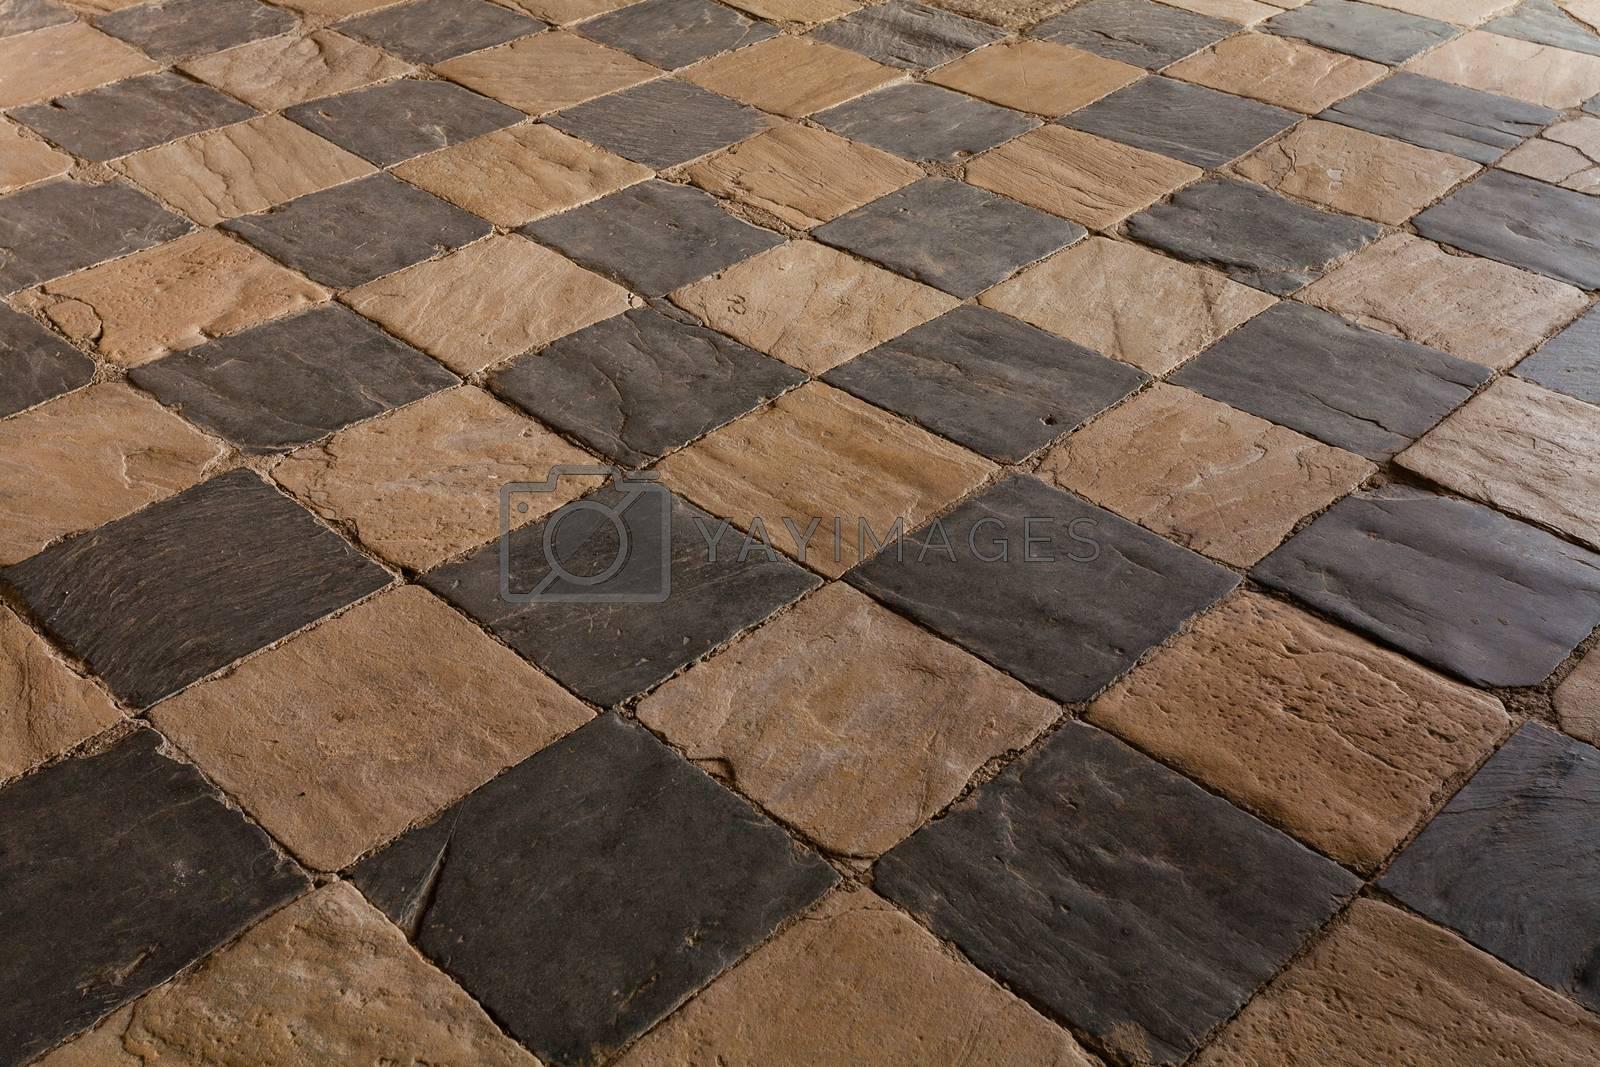 draughtboarded floor built in slate and limestone rocks in Spain